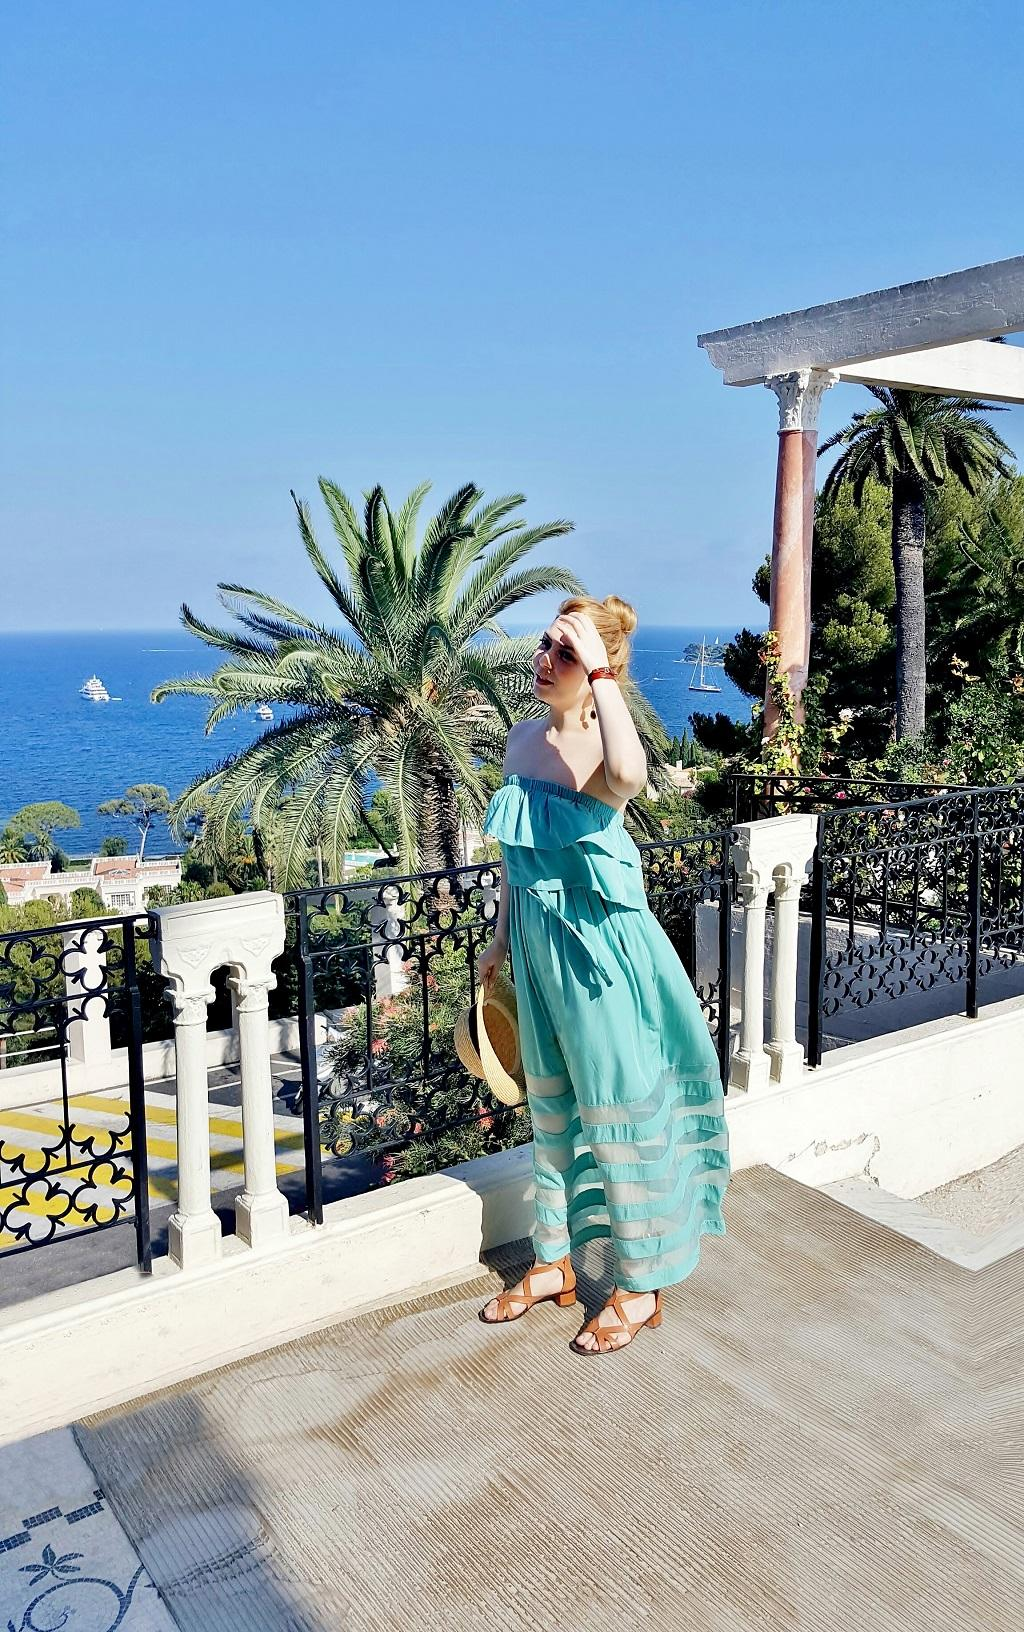 Cap Ferrat - Villa Ephrussi de Rothschild (5)